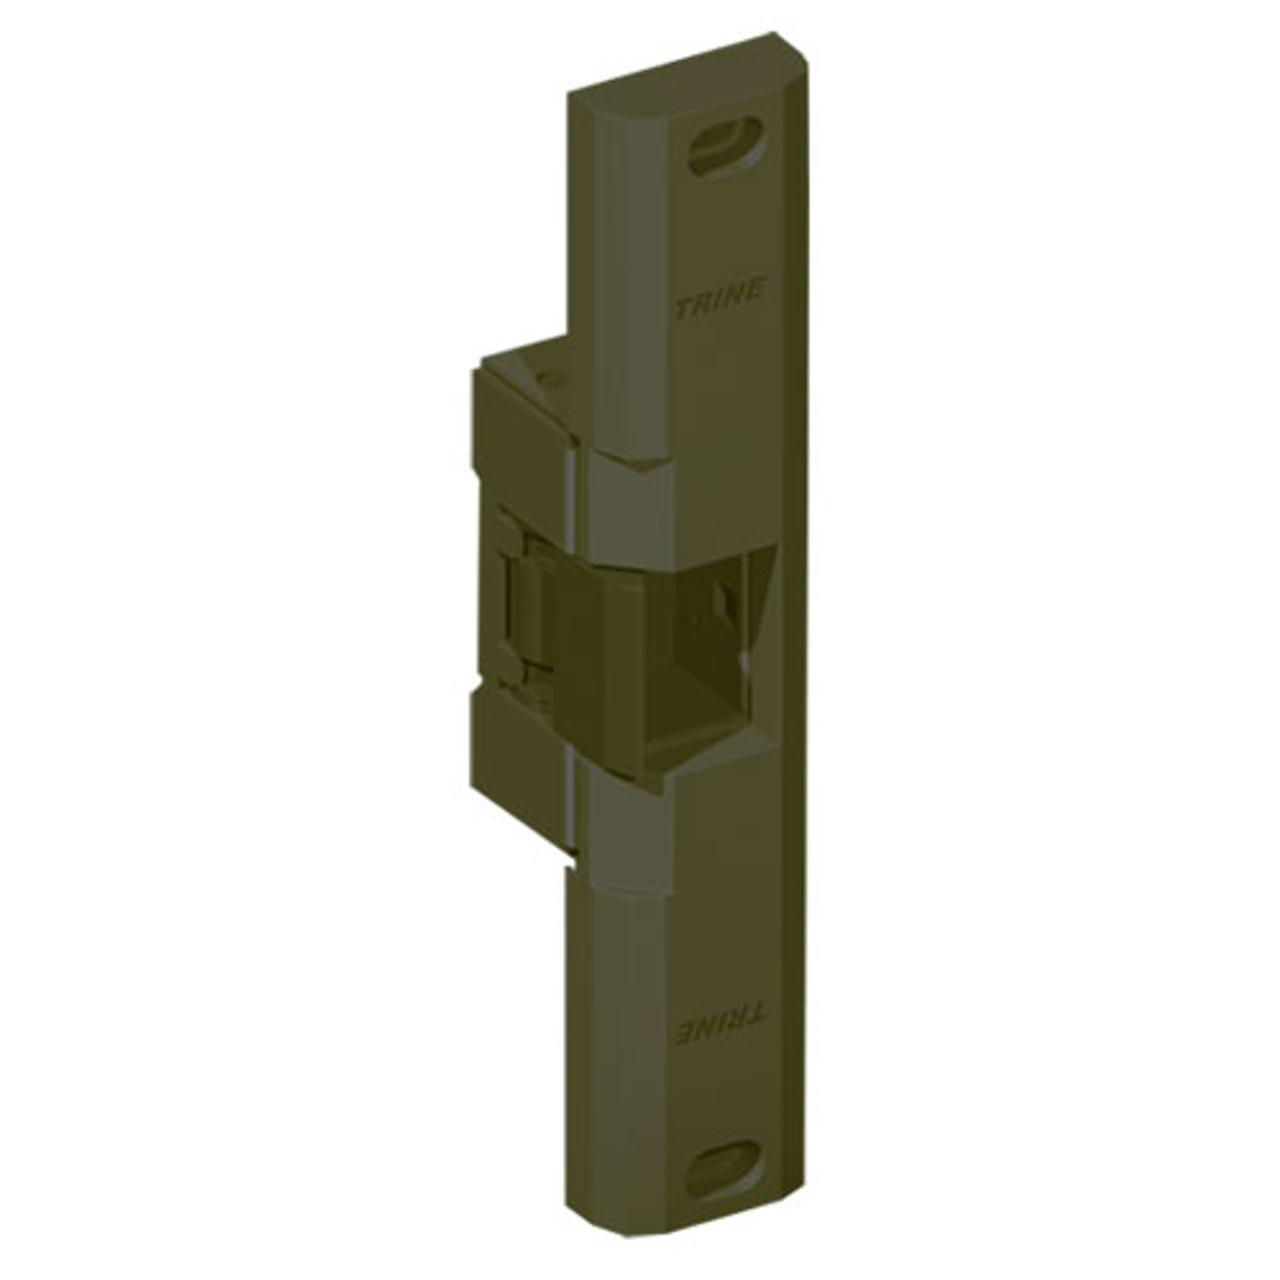 EN850-24DC-US10B-LH Trine EN Series Great for Outdoor Gates Electric Strikes in Dark Bronze Finish